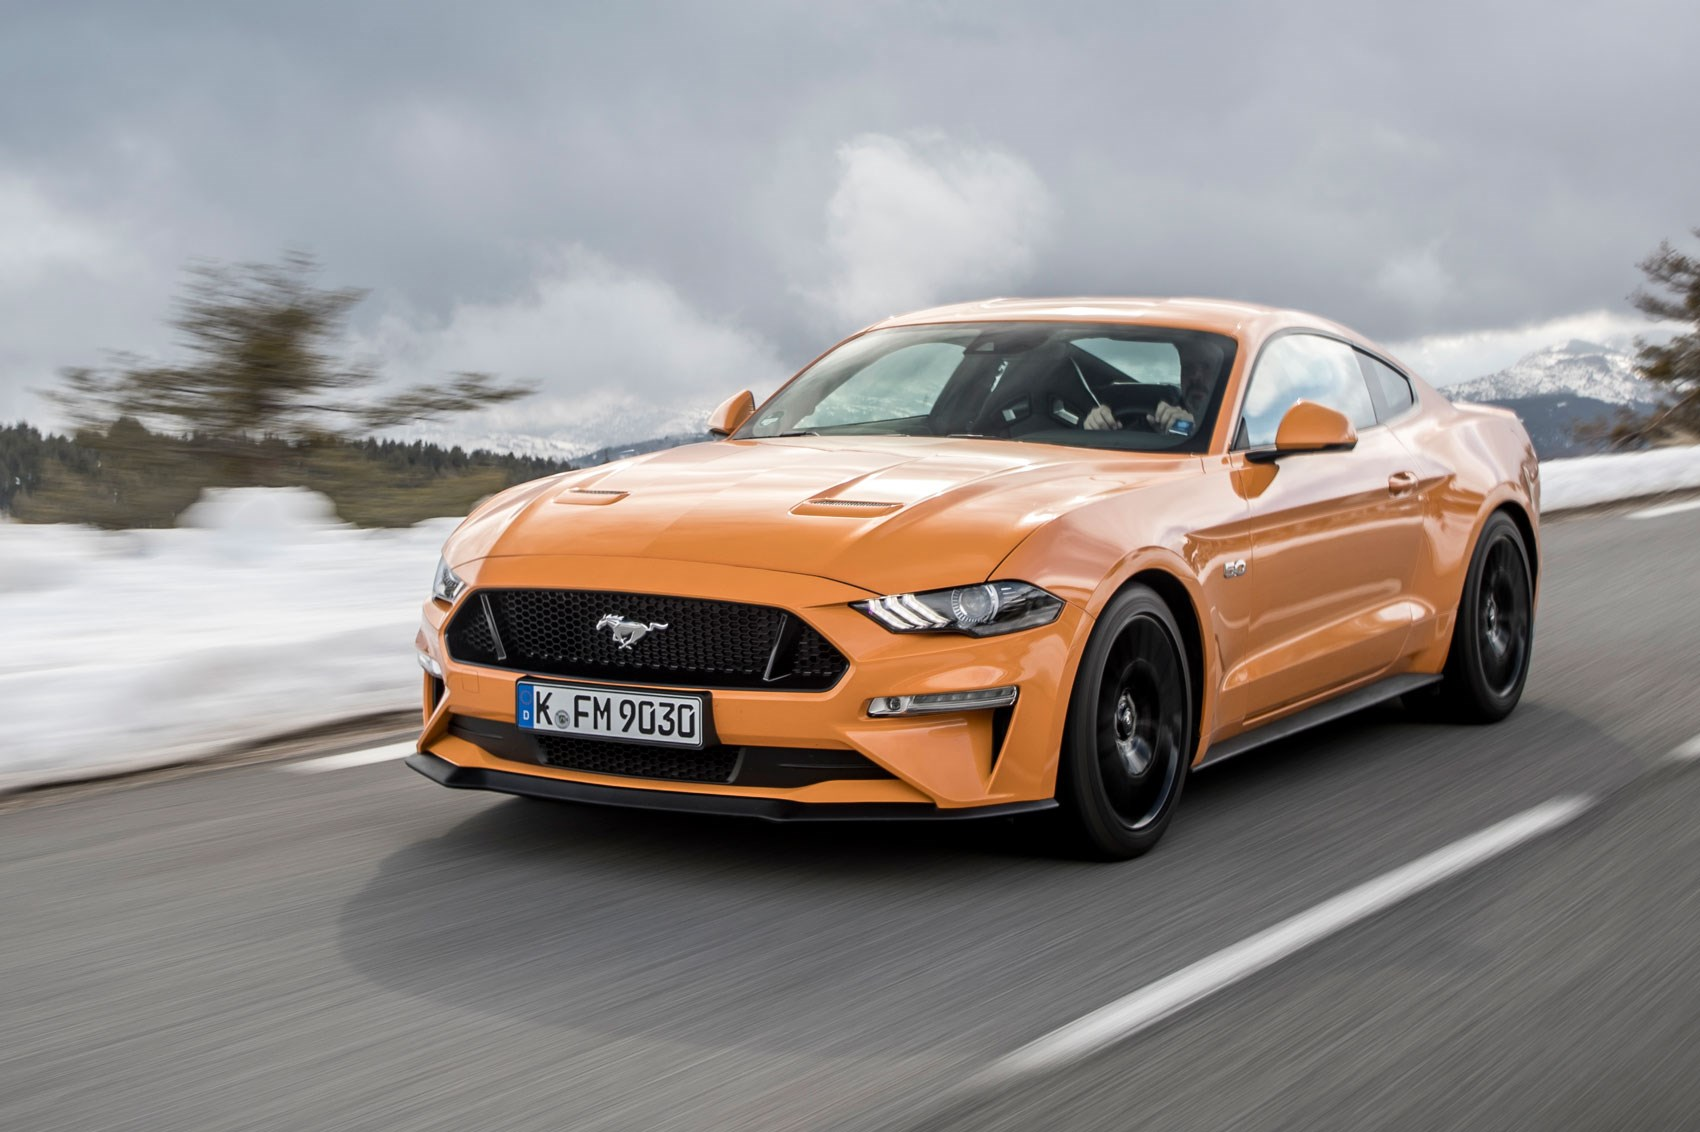 0 Down Lease Deals >> 0 Down Lease Deals Best Car Price 2020